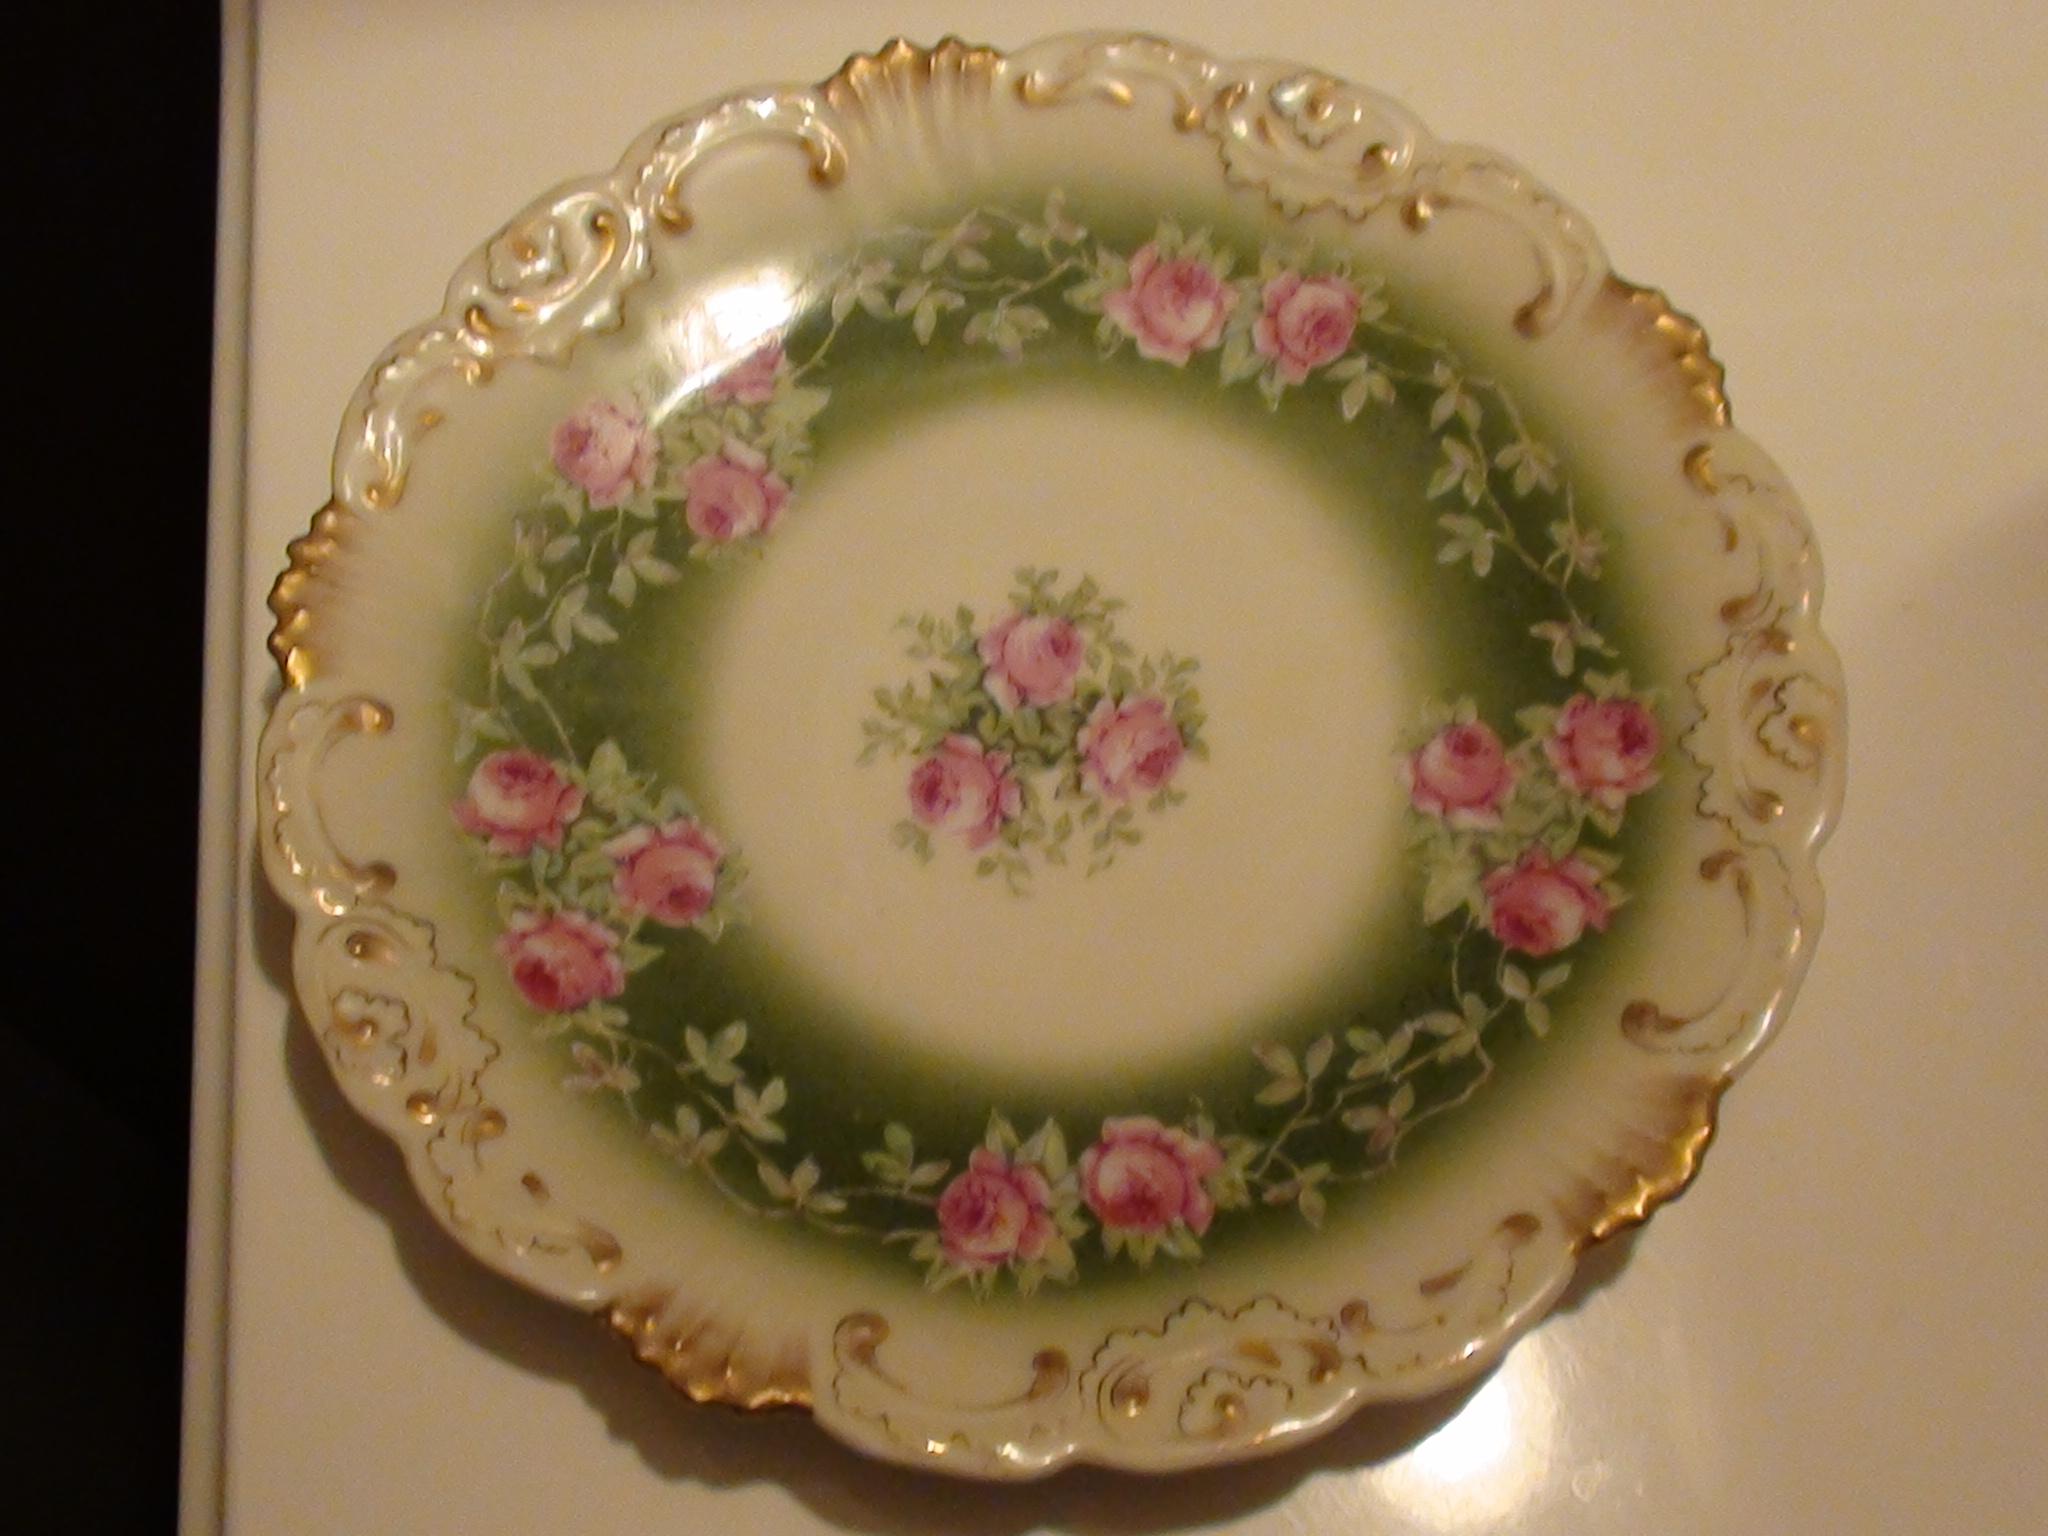 Holly Lane Antiques Identifying Antique Haviland Limoges Patterns - ll